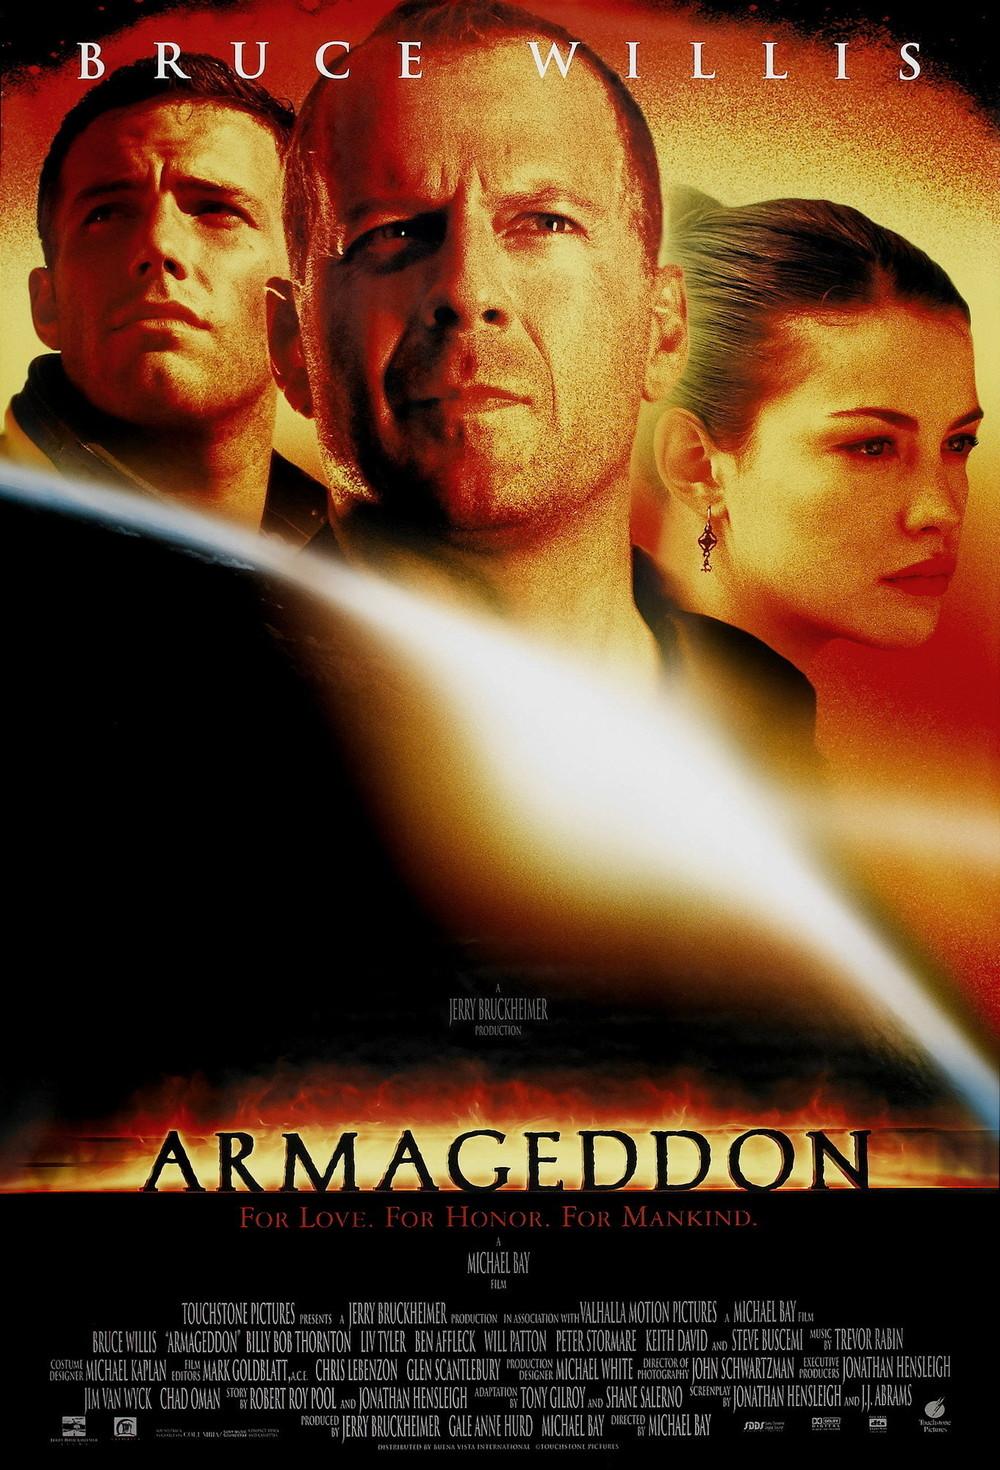 armageddon-poster.jpg